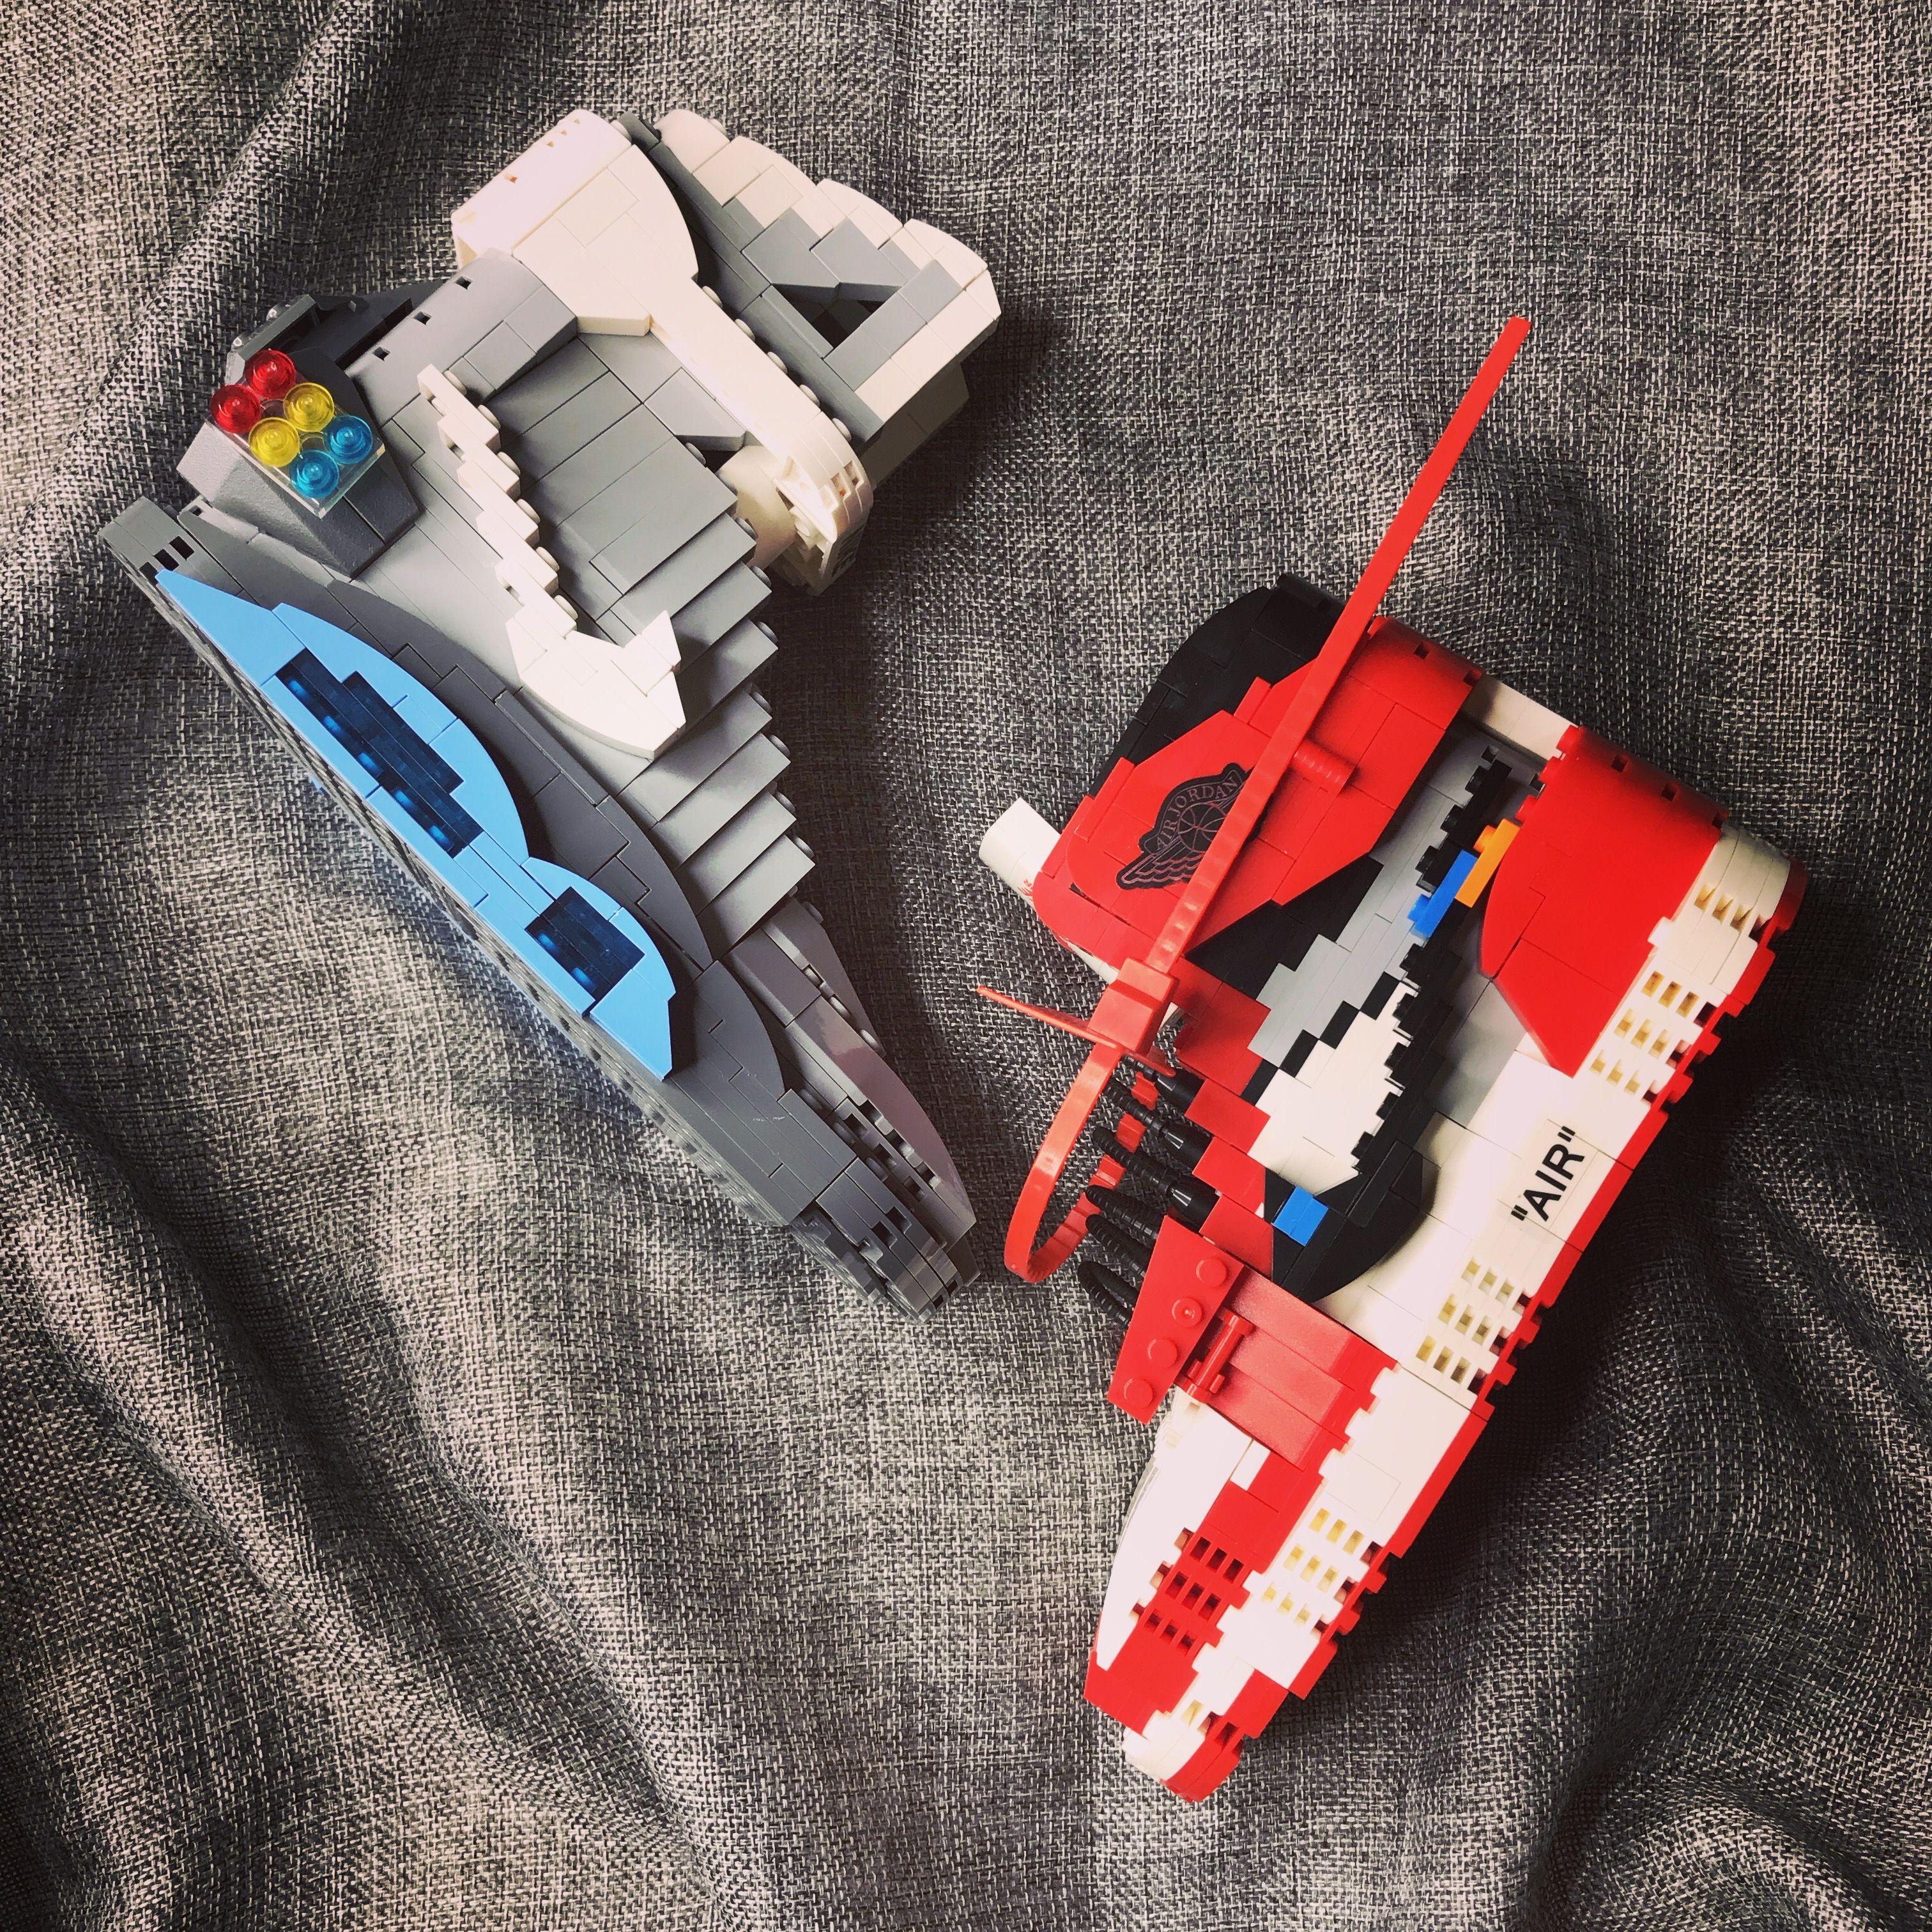 Pin on Sneakerhead's worldwide